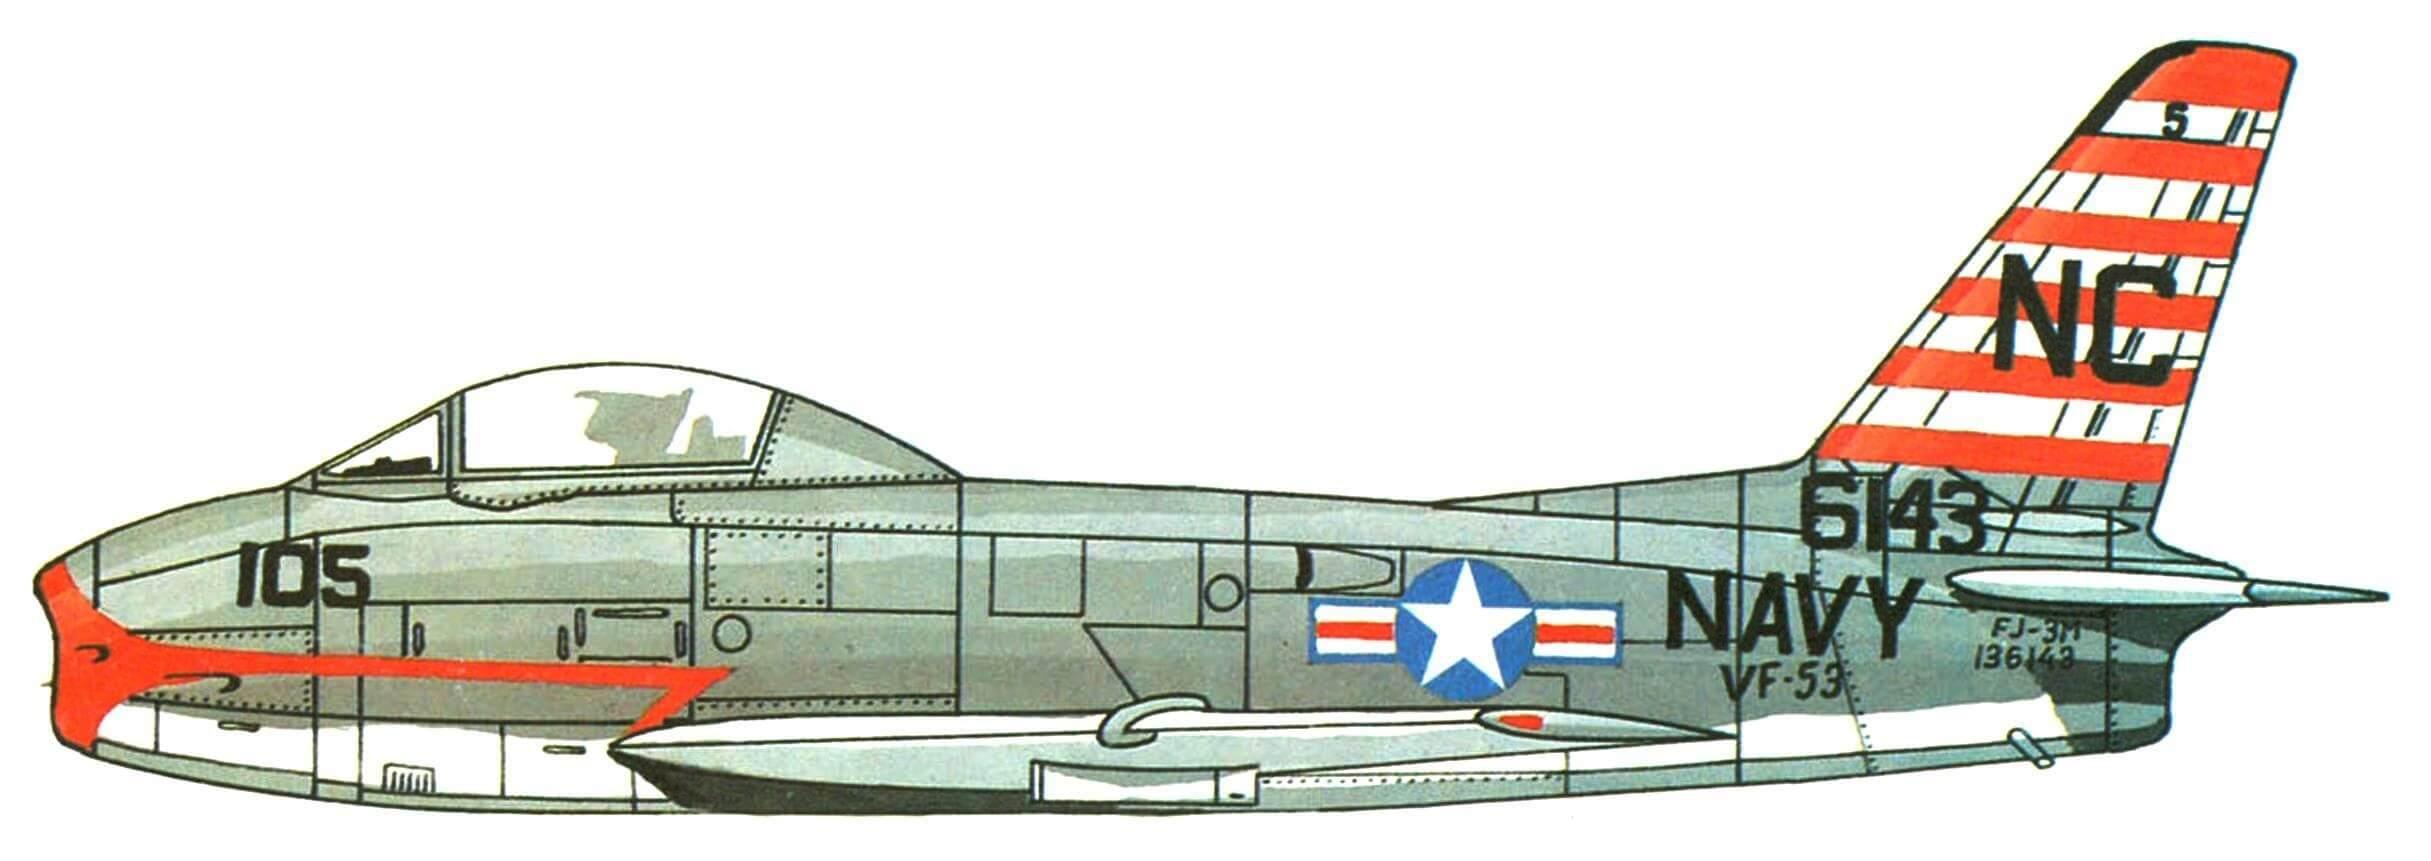 "FJ-3M эскадрильи VF-53, авианосец ""Kirsarge"", 1957r."